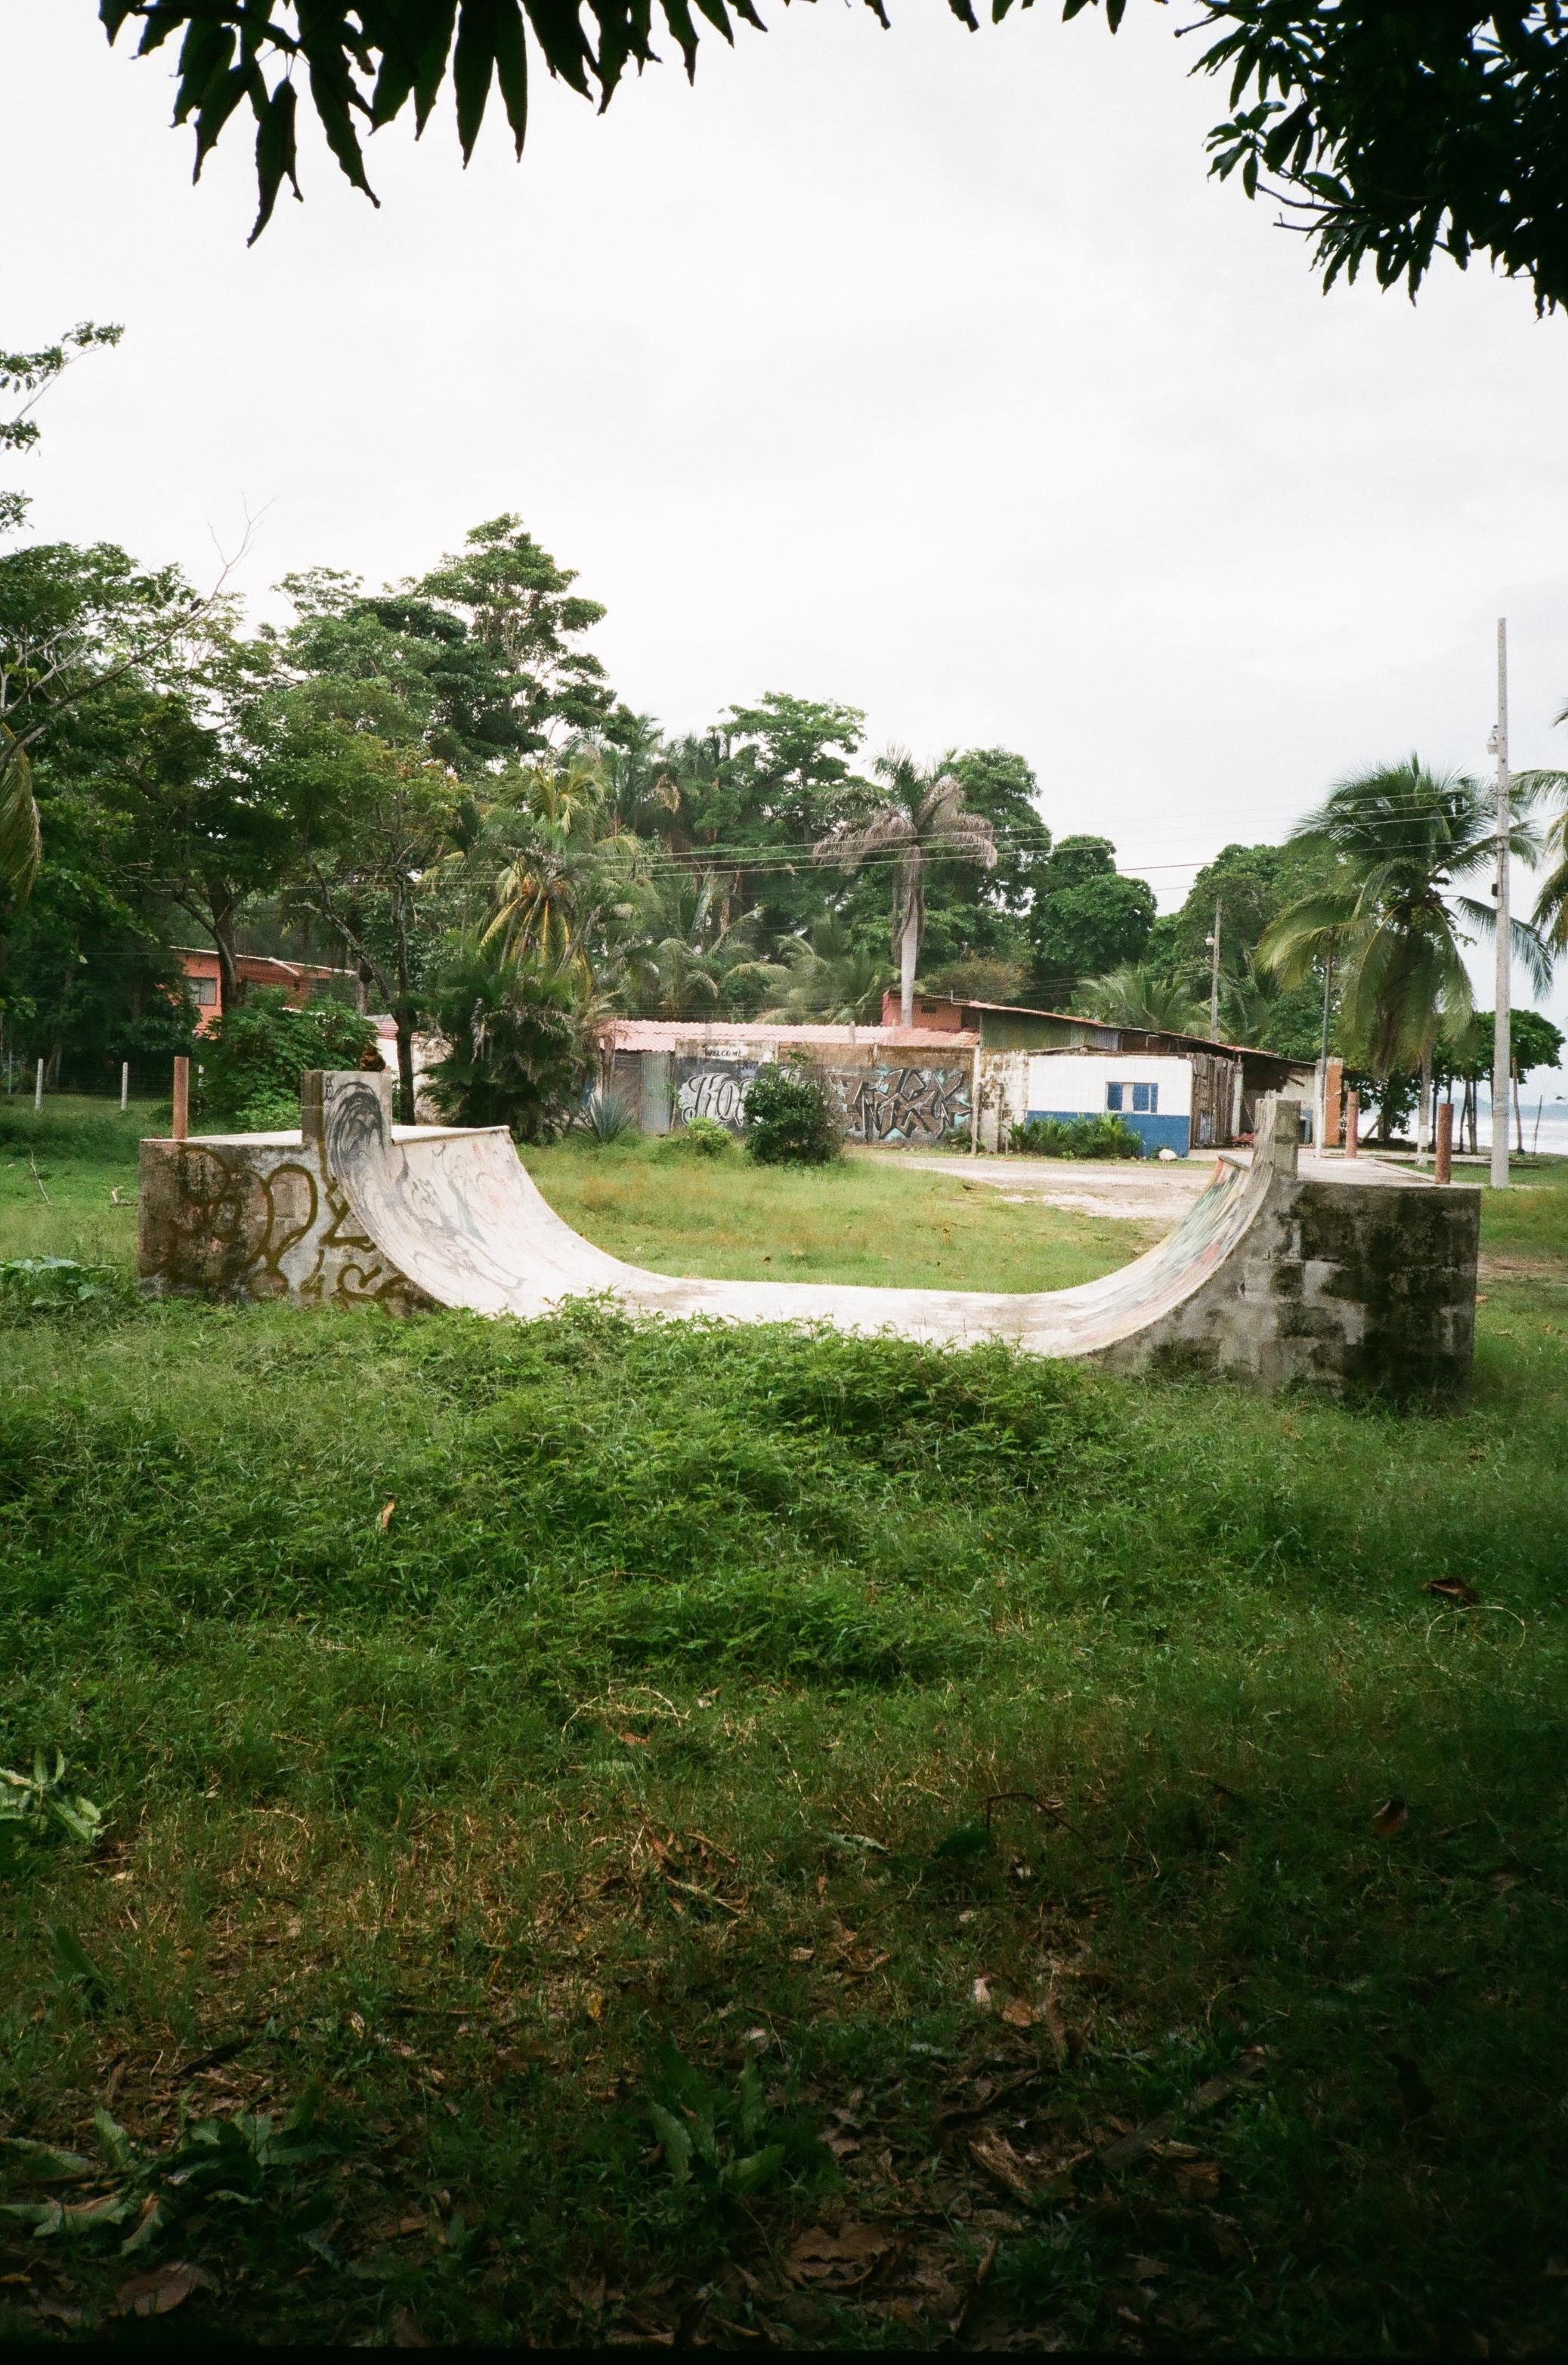 Esterillos Oeste, Puntarenas Province, Costa Rica